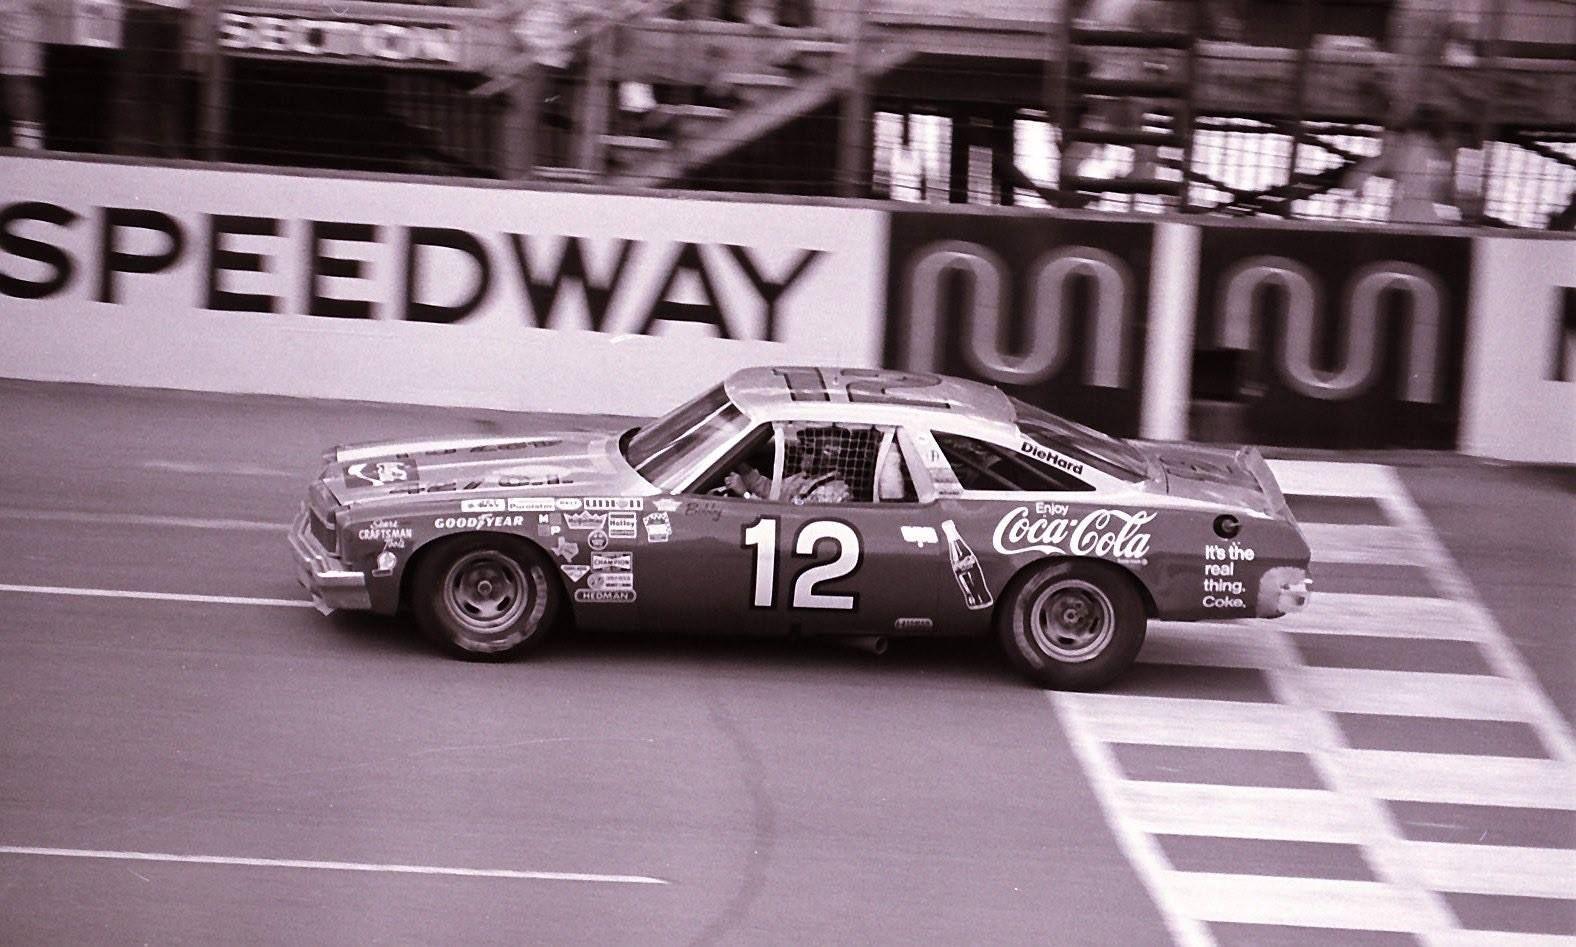 Bobby Allison 1973 Chevy Malibu Michigan Speedway Chevy